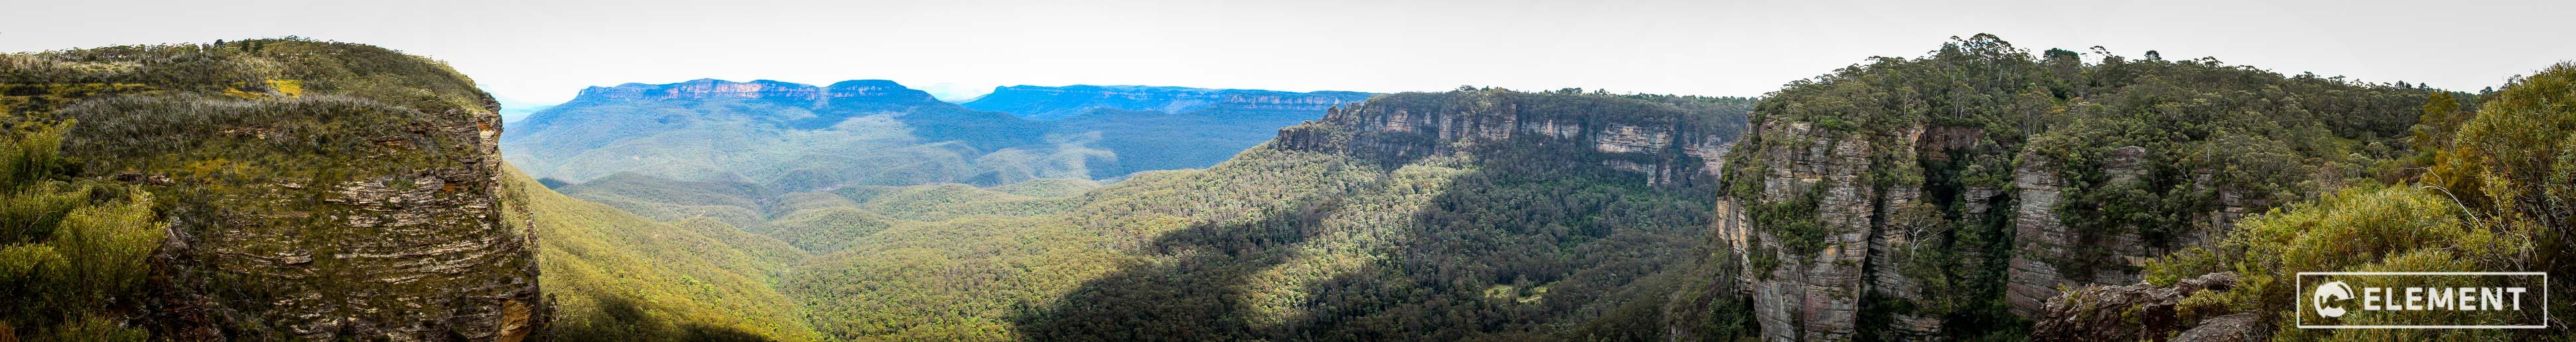 kings-table-land-blue-mountains-panorama